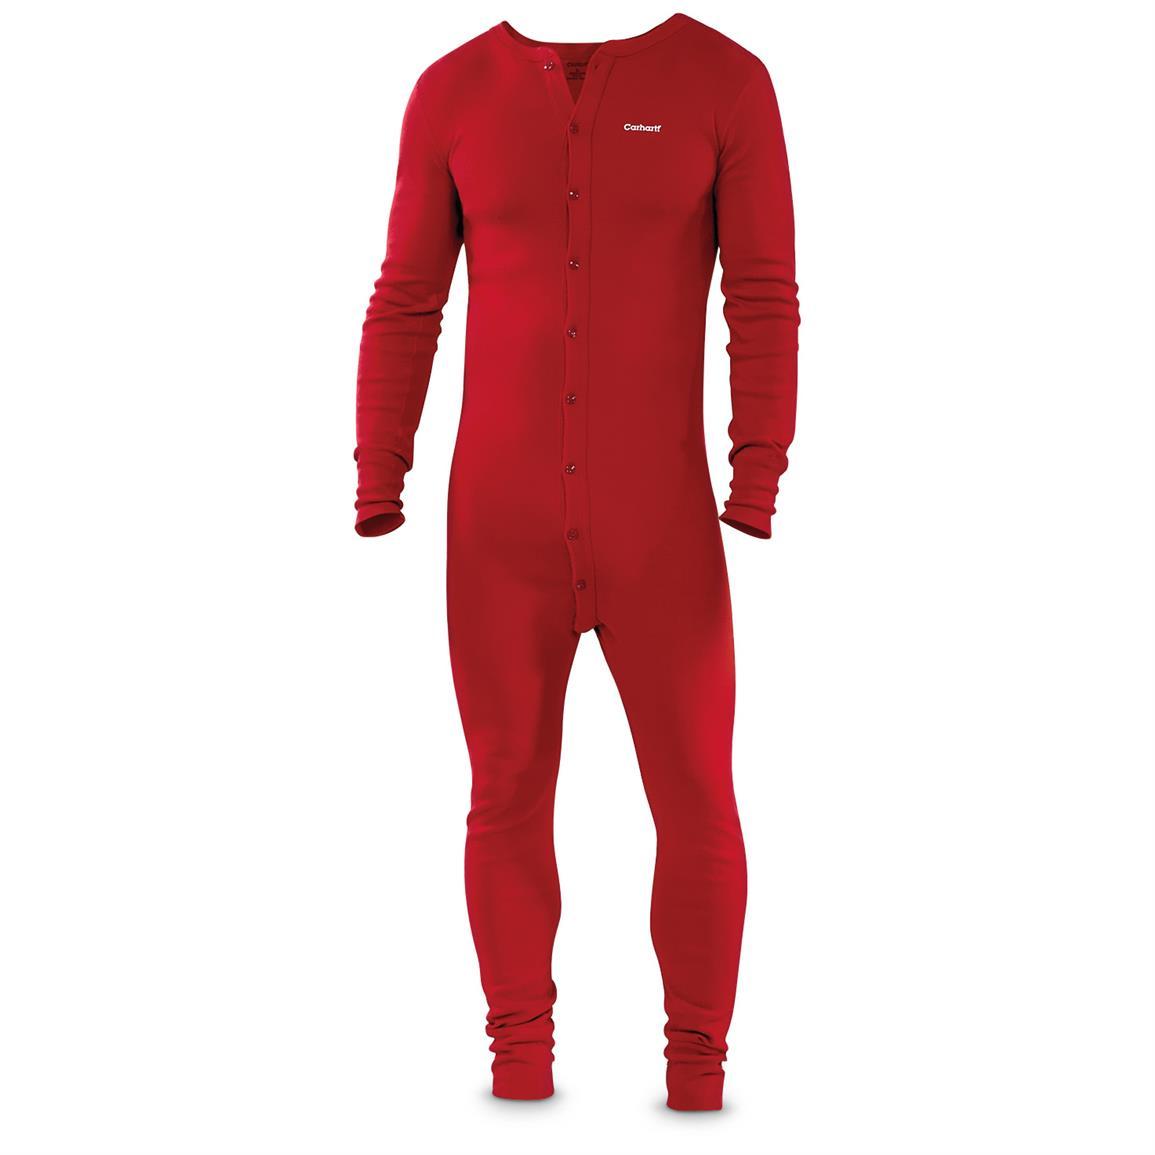 Carhartt Mens Cotton Union Suit Long Underwear - 635656 Underwear  Base Layer at Sportsmans